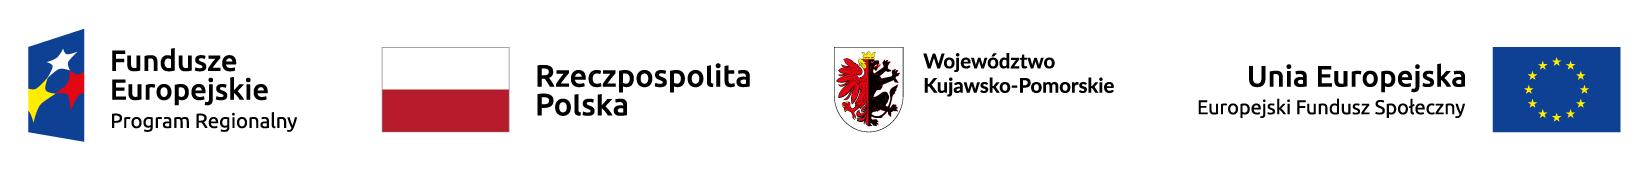 Logotypy EFS - kolor - bez LGD